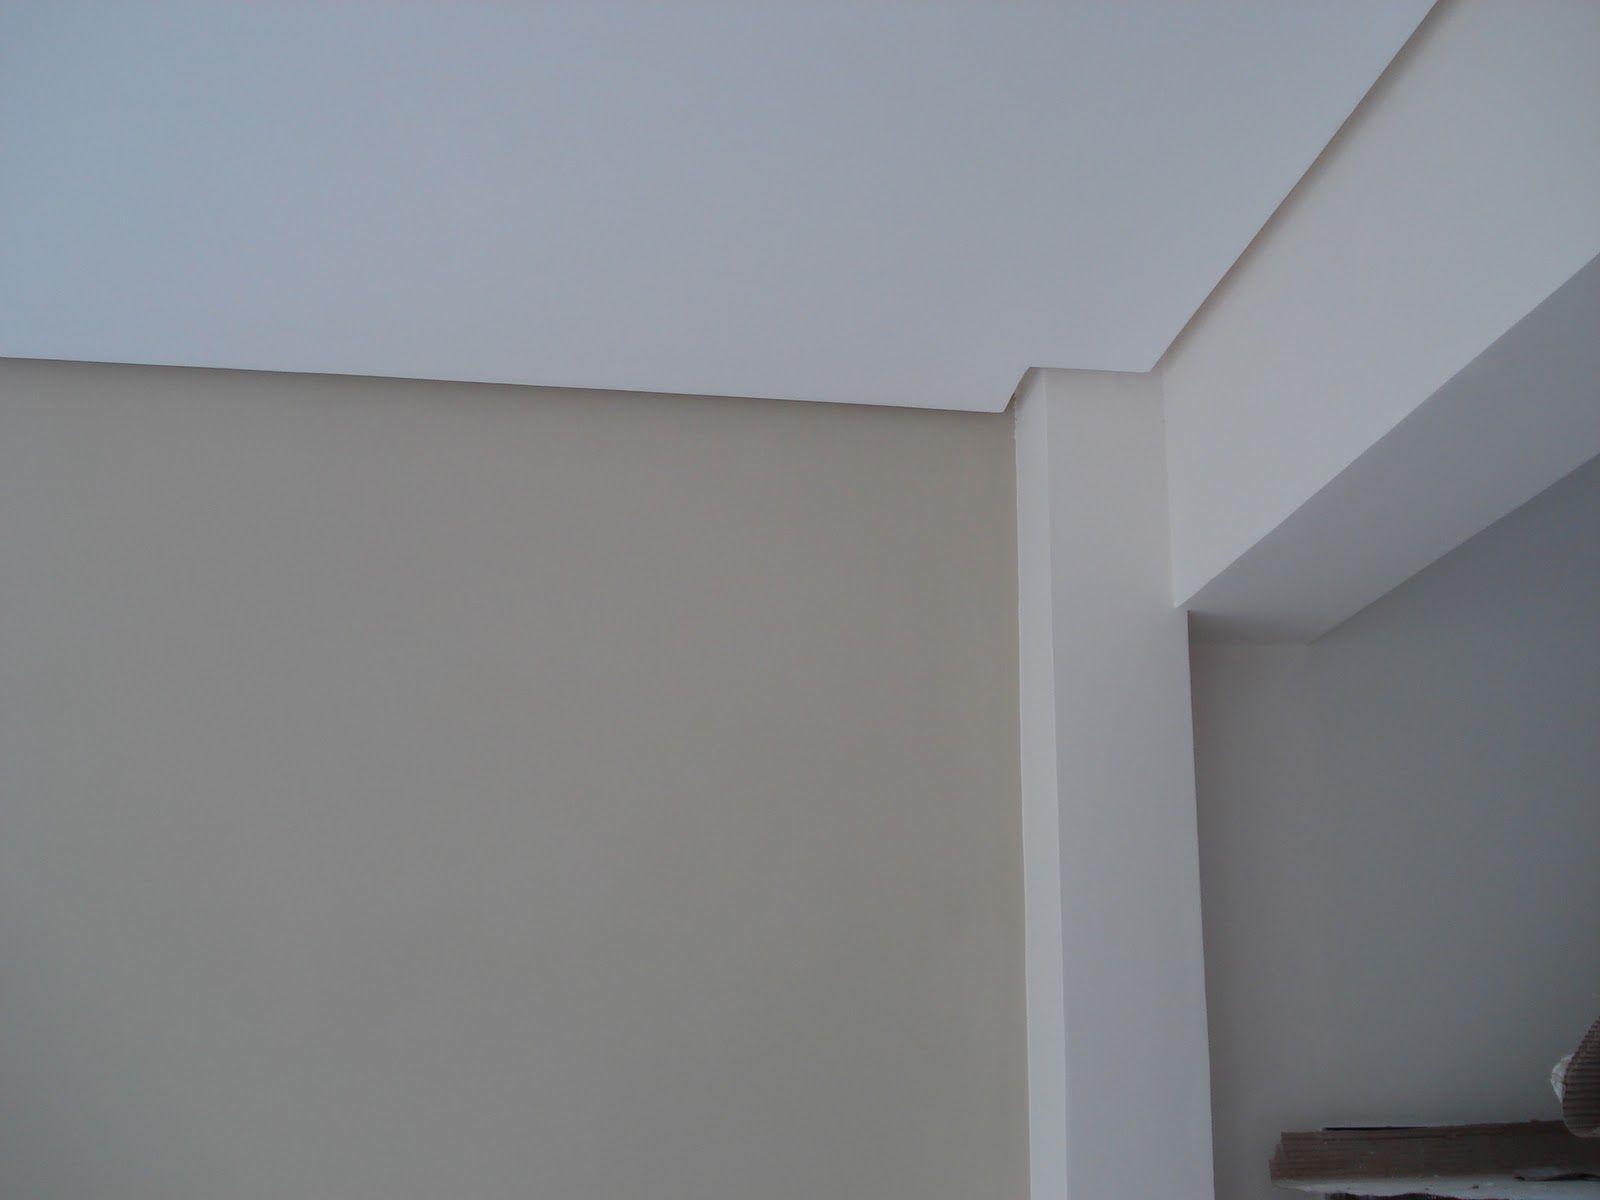 DSC04176.JPG (1600×1200)